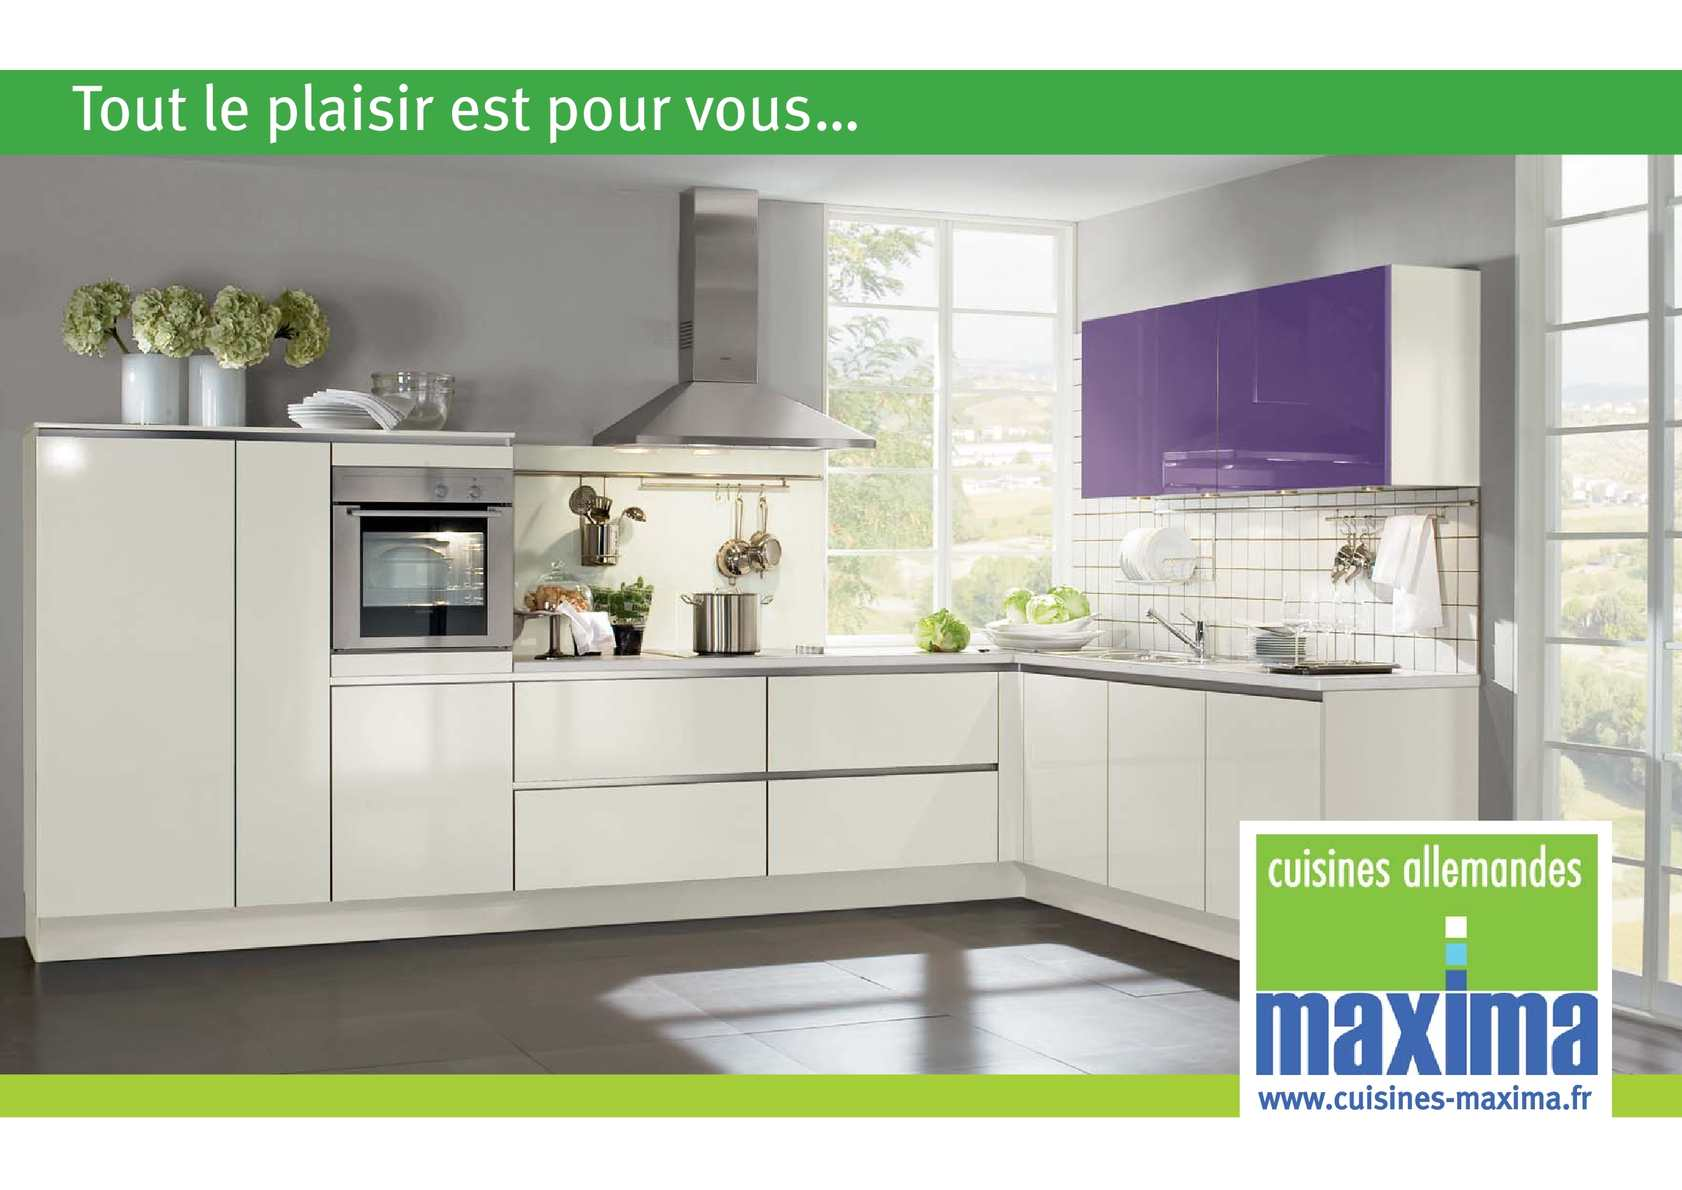 calam o catalogue maxima 2012. Black Bedroom Furniture Sets. Home Design Ideas